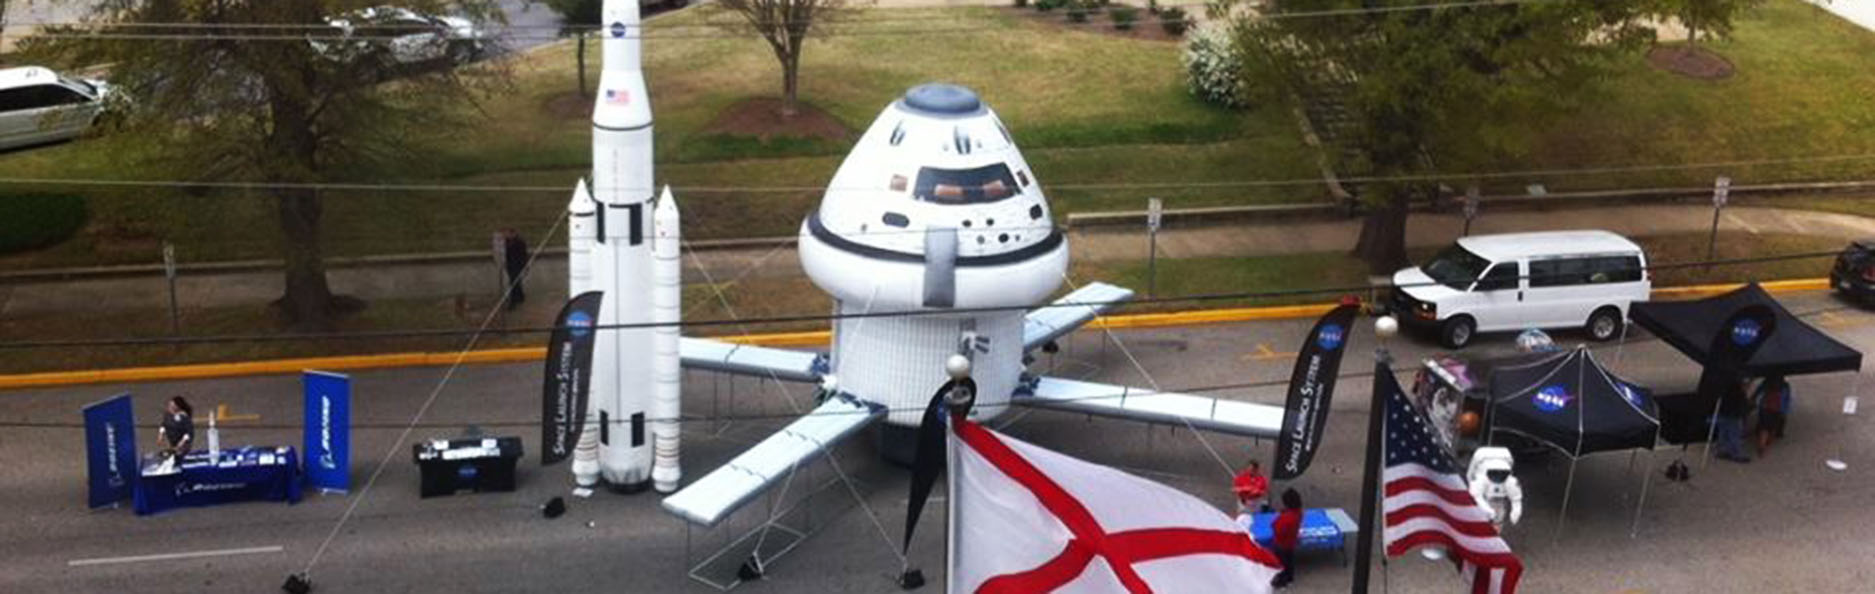 custom-inflatable-spacecraft-street-event.jpg